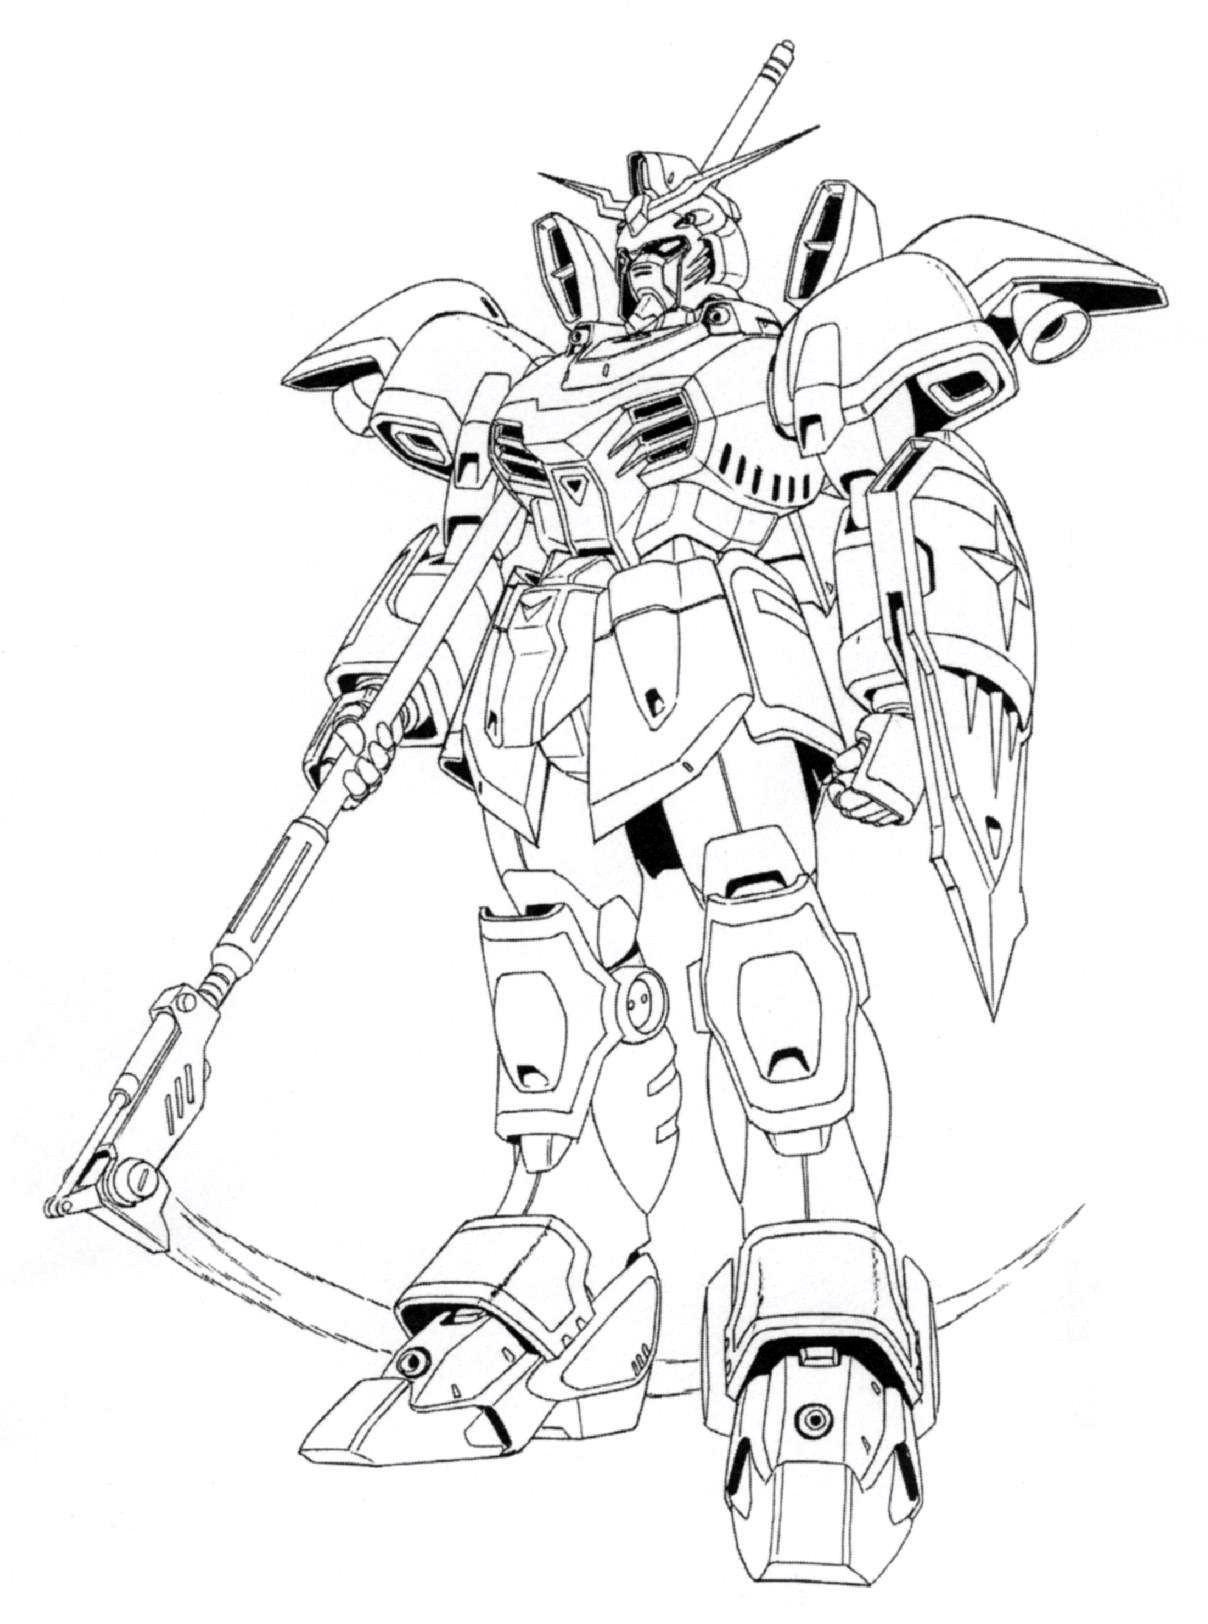 Latest 1208 1624 Sailor Moon Coloring Pages Gundam Art Mobile Suit Gundam Wing